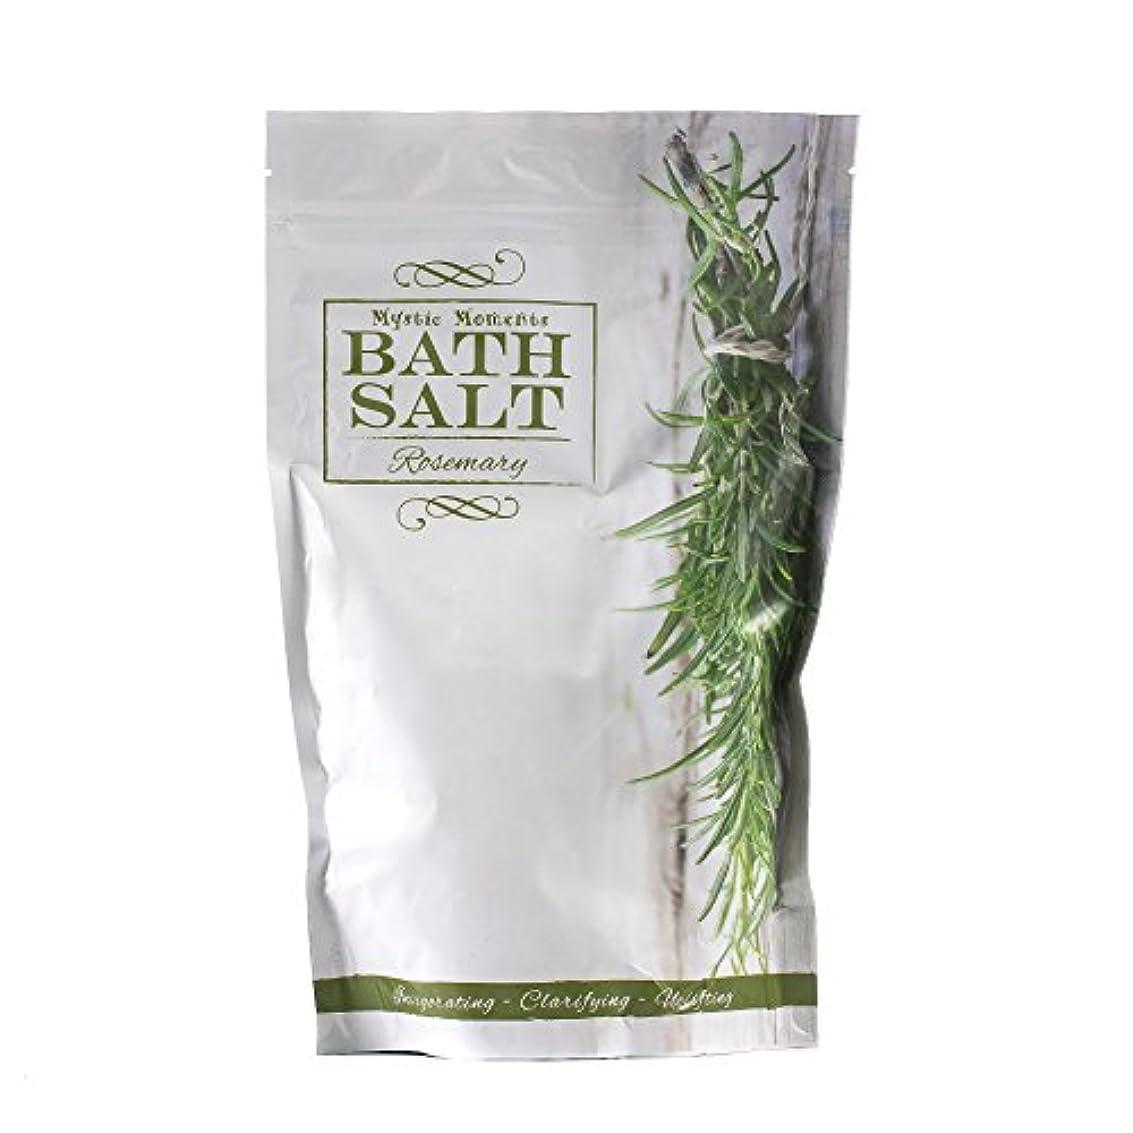 Bath Salt - Rosemary - 1Kg